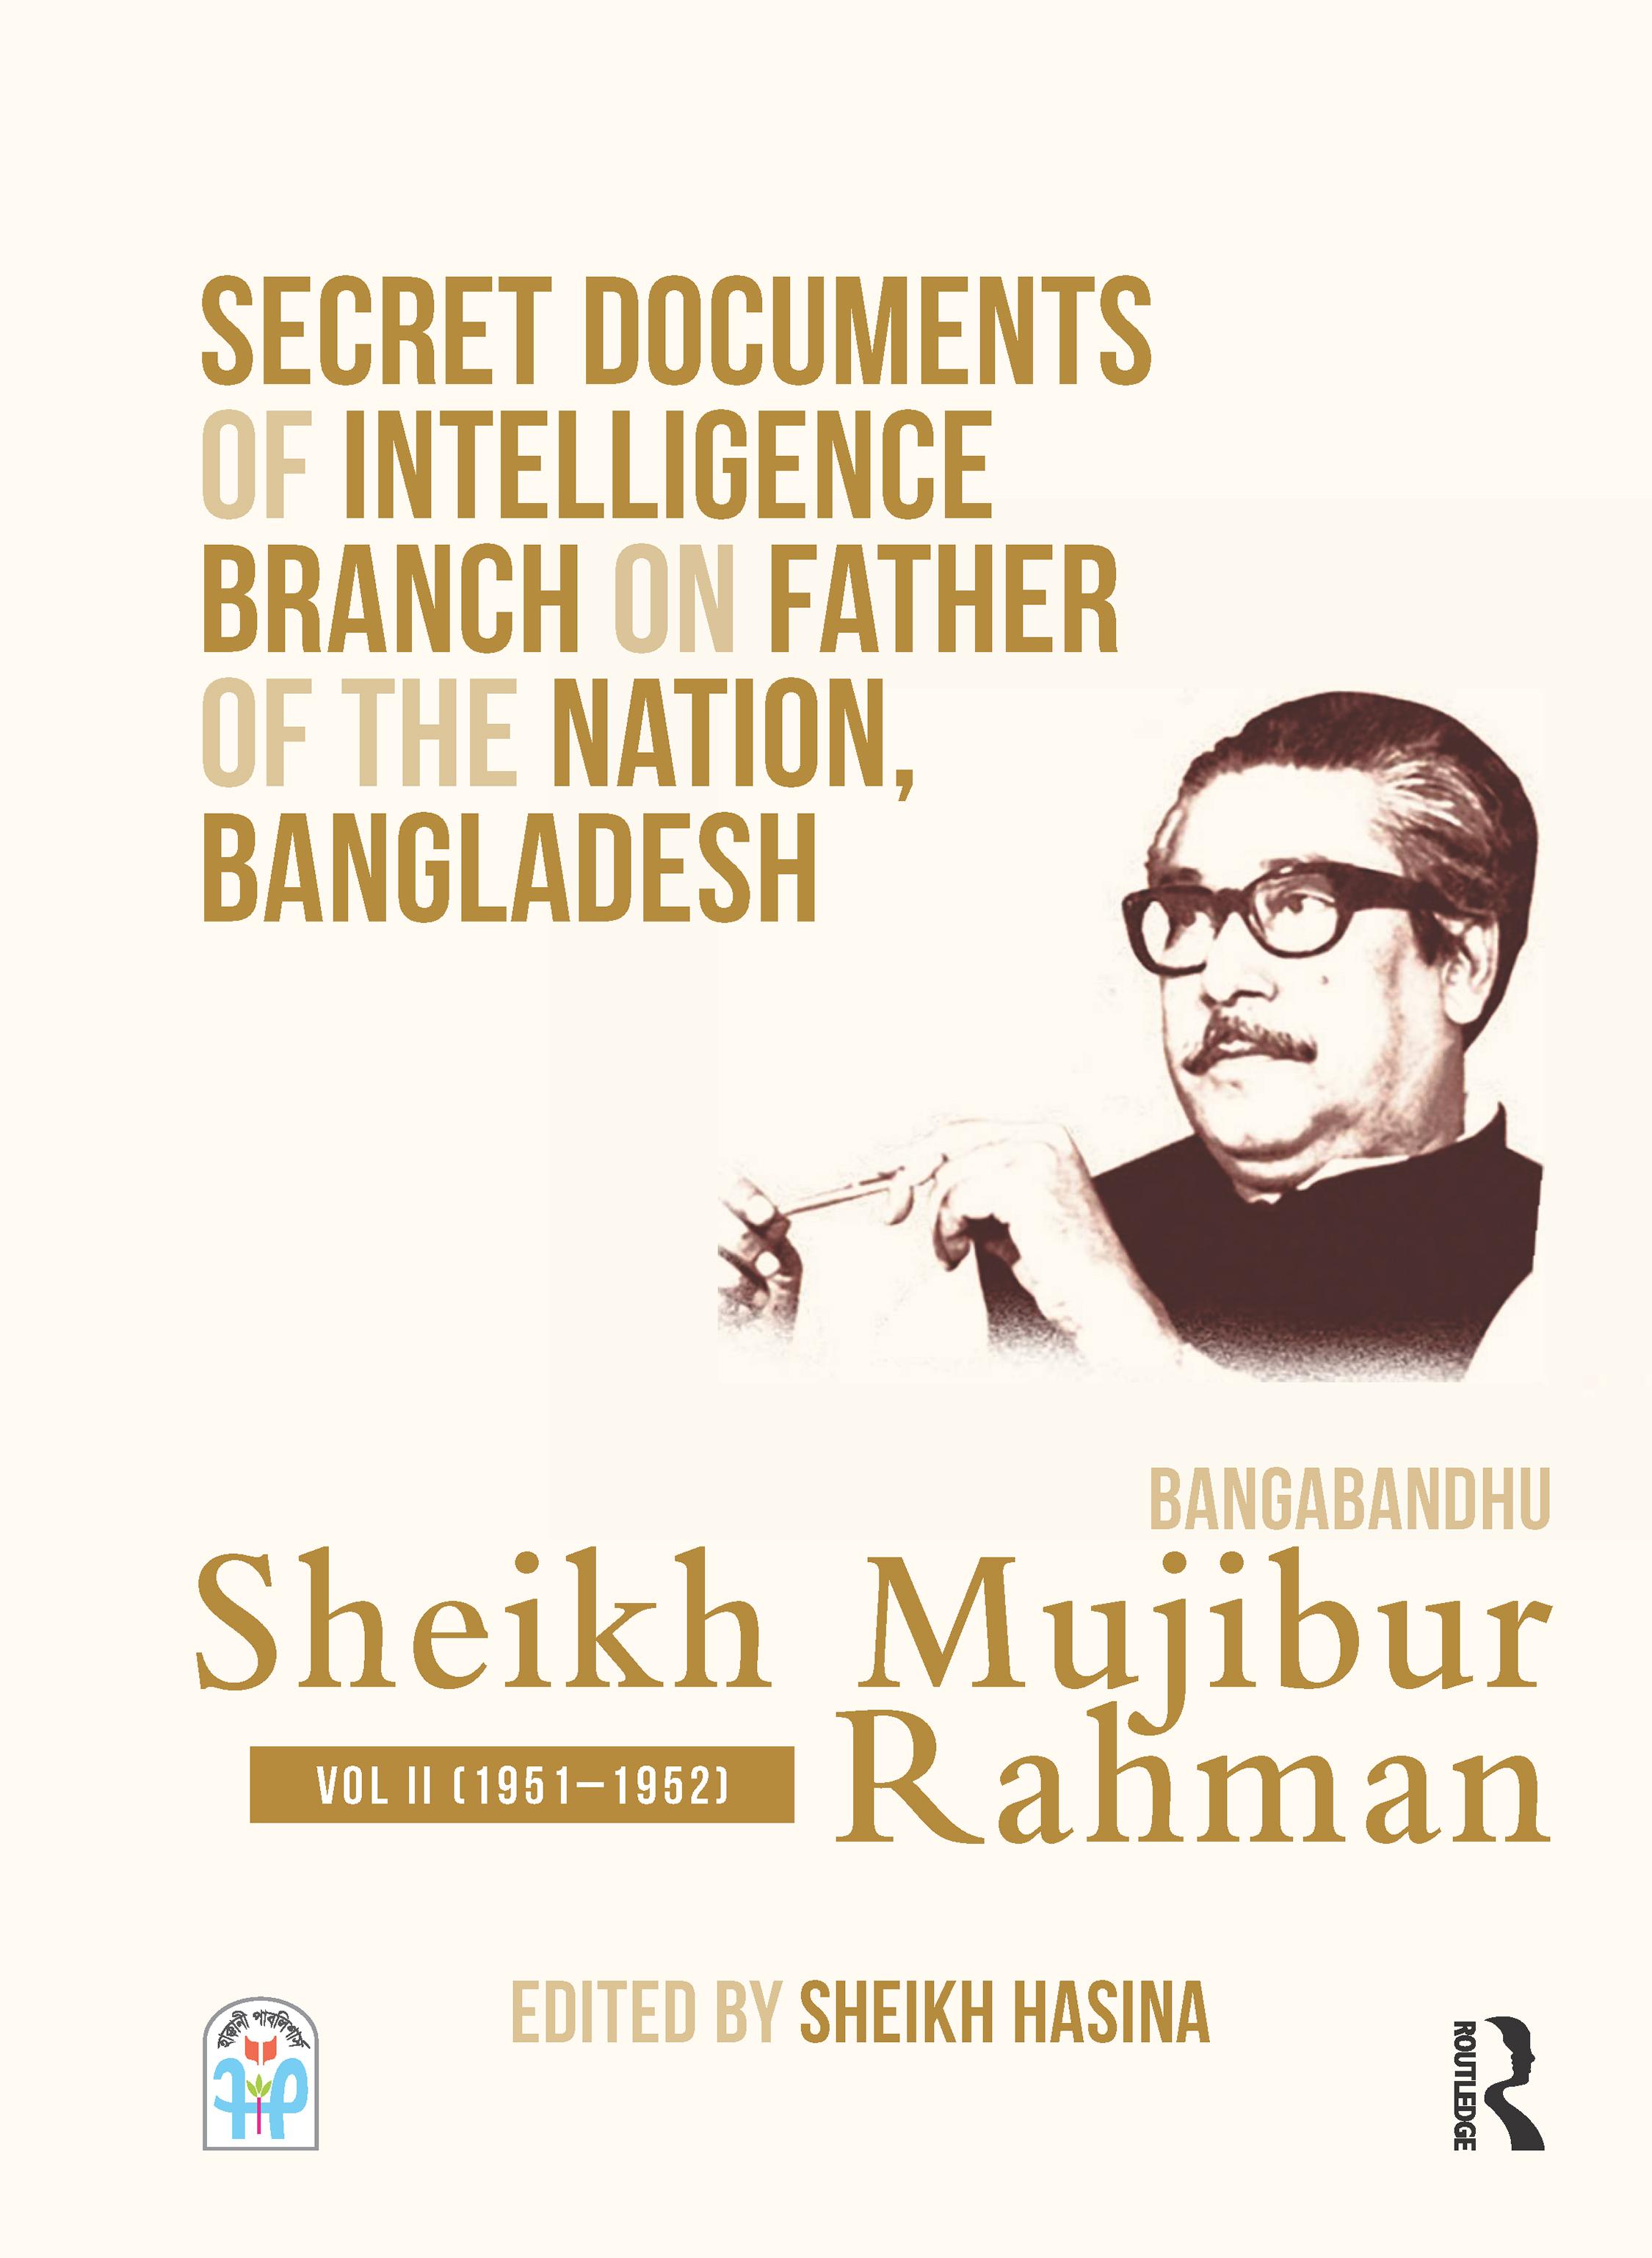 Secret Documents of Intelligence Branch on Father of The Nation, Bangladesh: Bangabandhu Sheikh Mujibur Rahman: Volume 2 (1951-1952) book cover